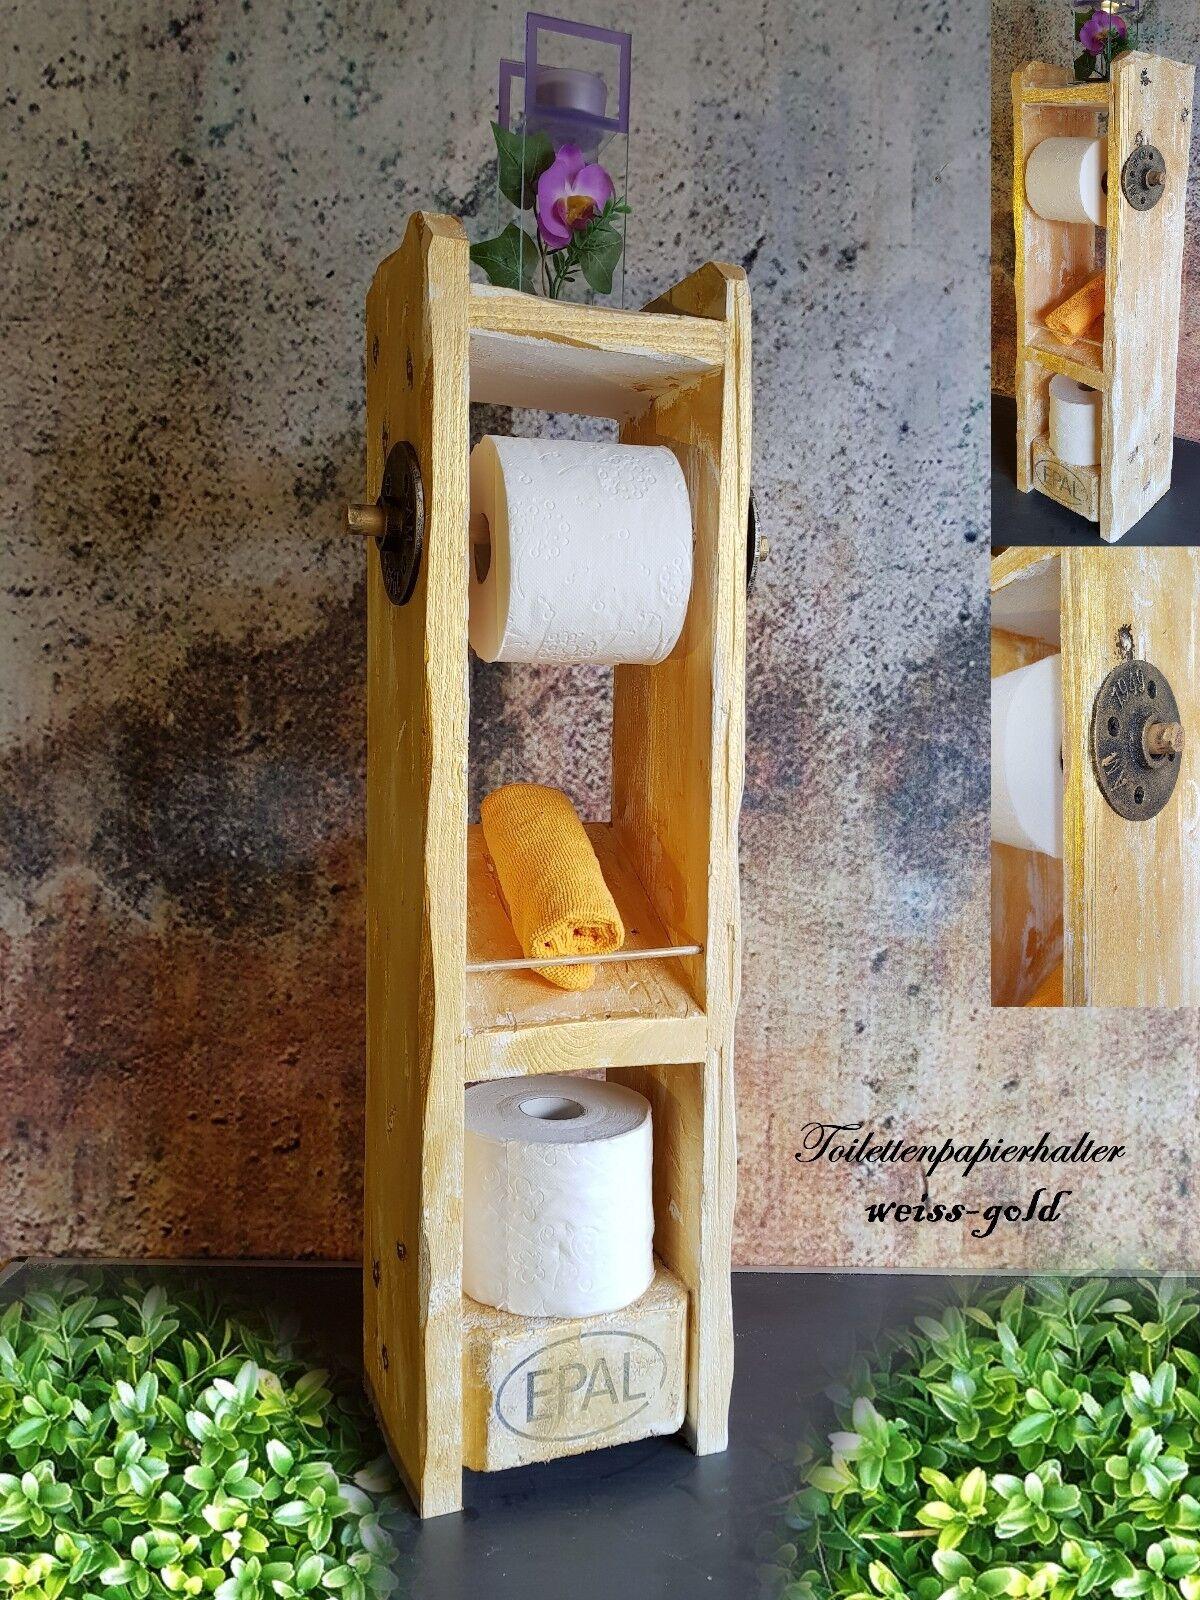 Toilettenpapierhalter Palettenmöbel Klopapierhalter Holz Shabby  Bad Design Gold